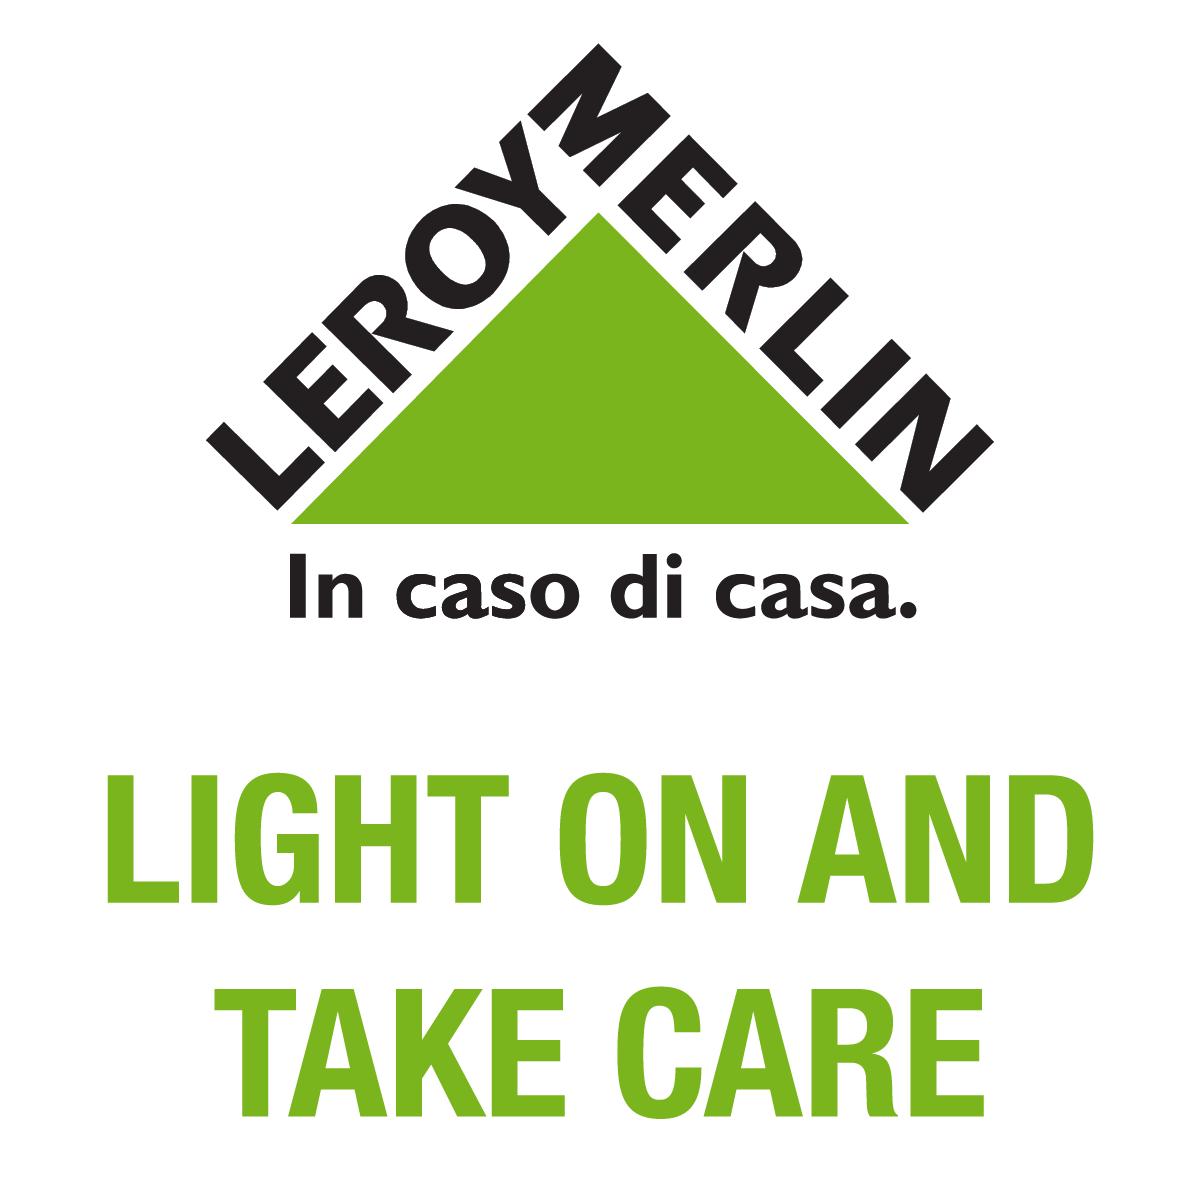 LeroyMerlin_image-size-promo_1200x1200